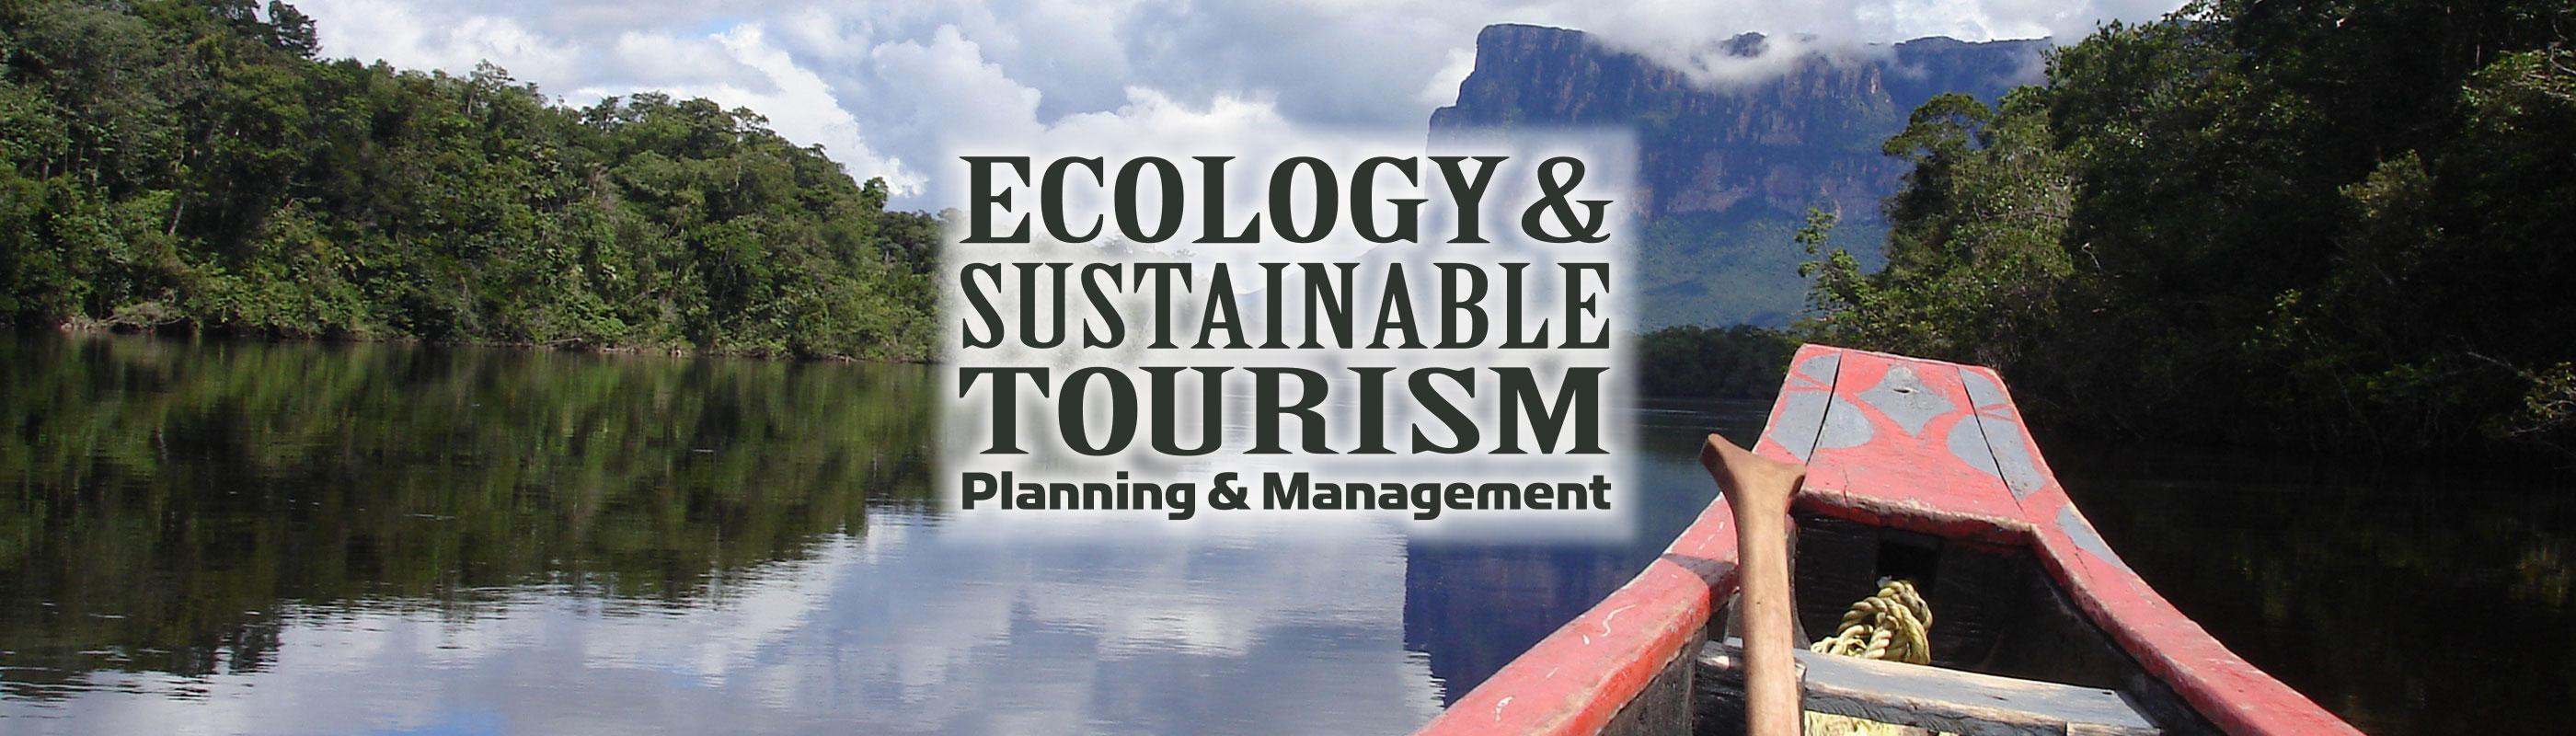 Ecology & Sustainable Tourism Planning & Management